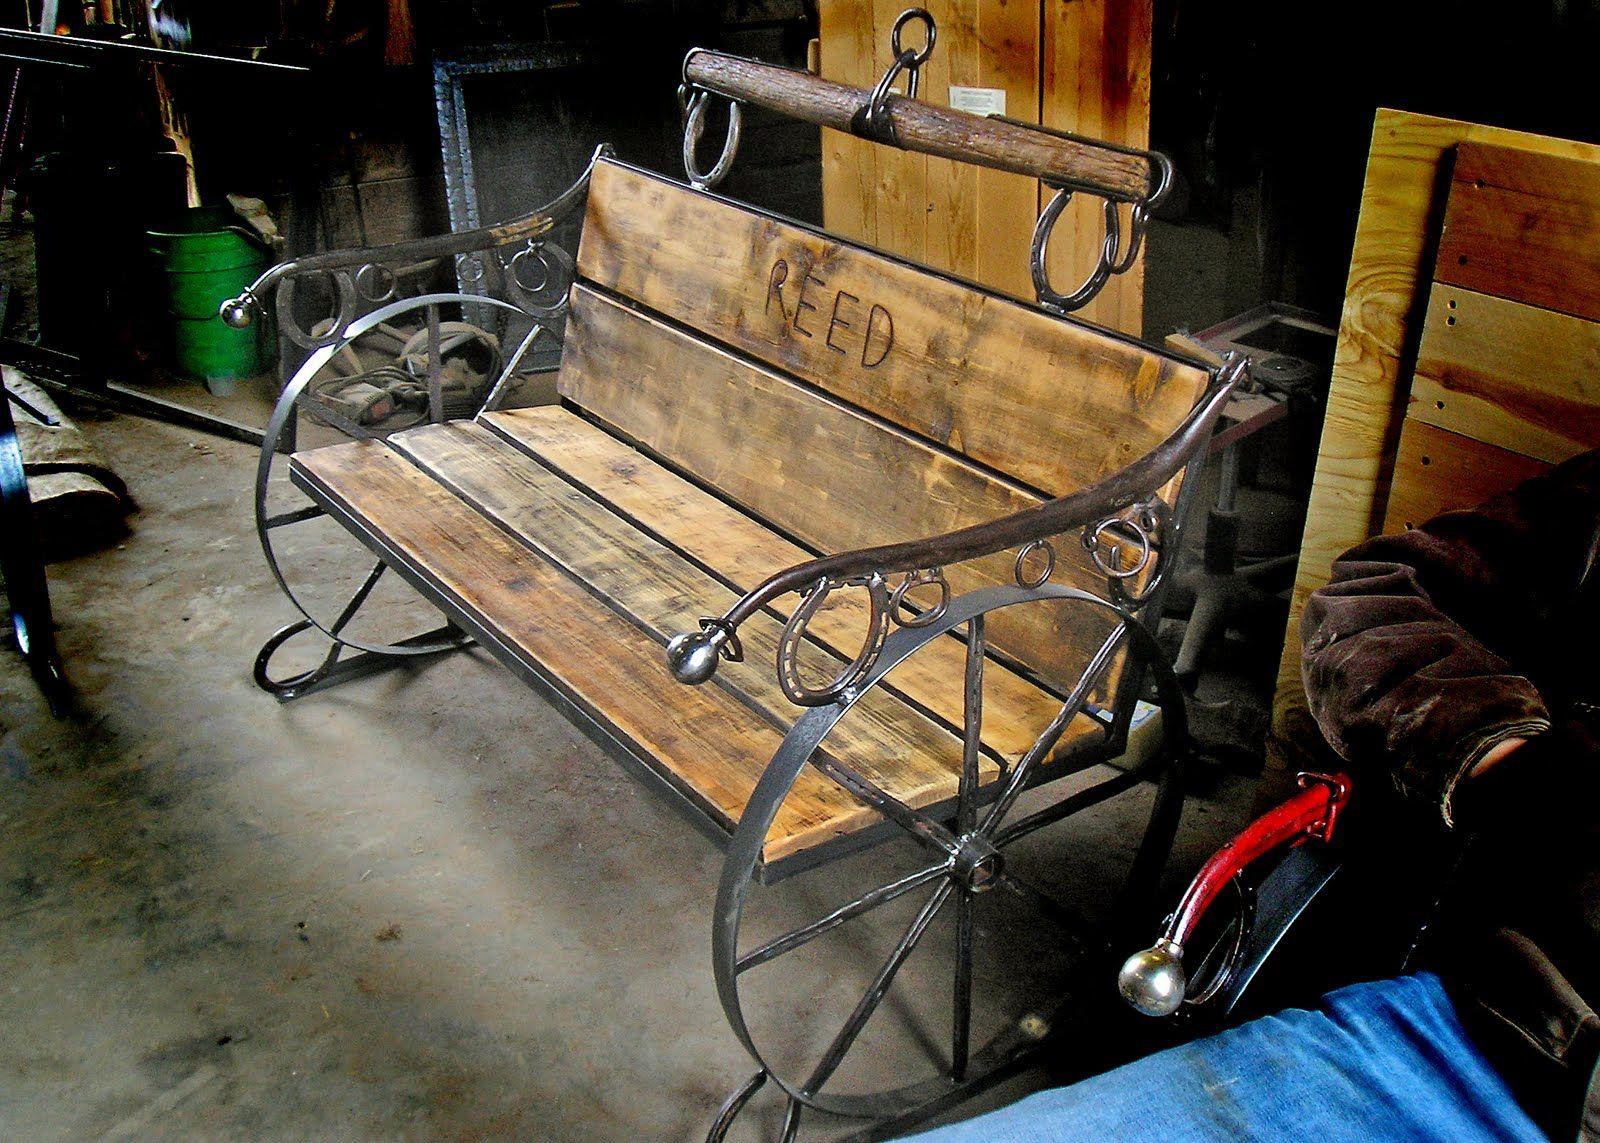 Reeds Blacksmith Wagon Wheel Bench Happy Place